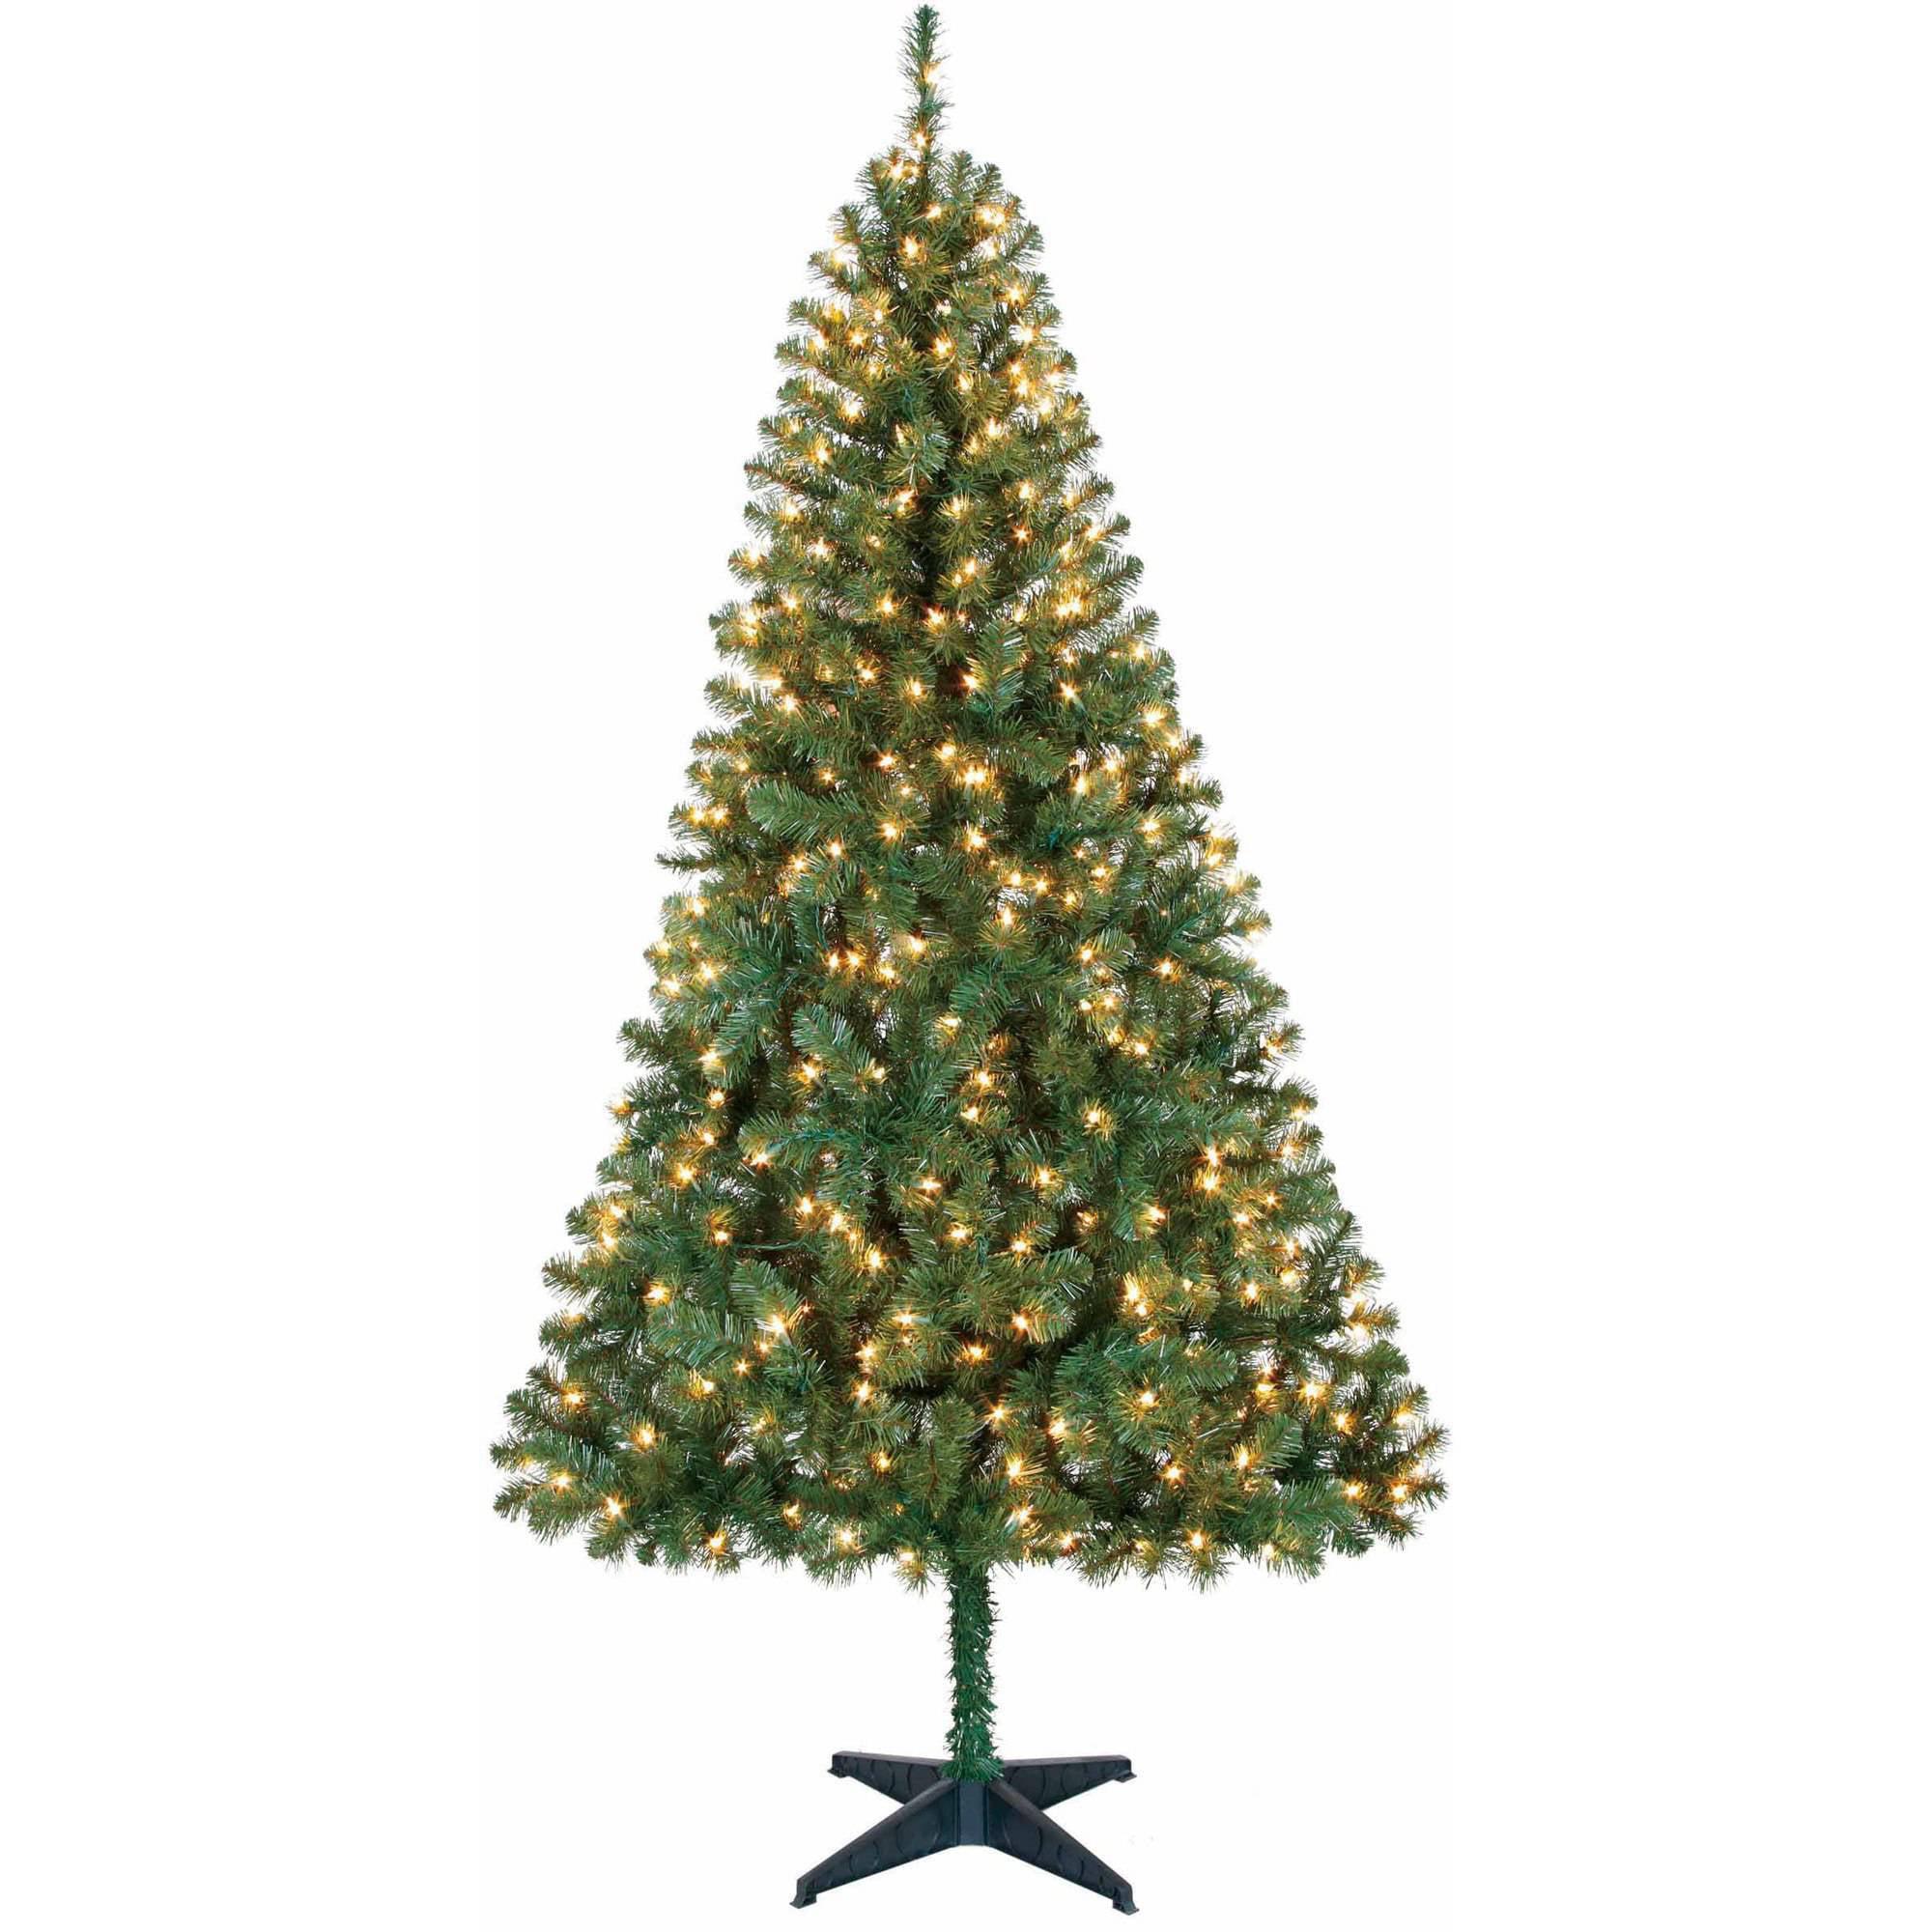 Best Looking Artificial Christmas Tree